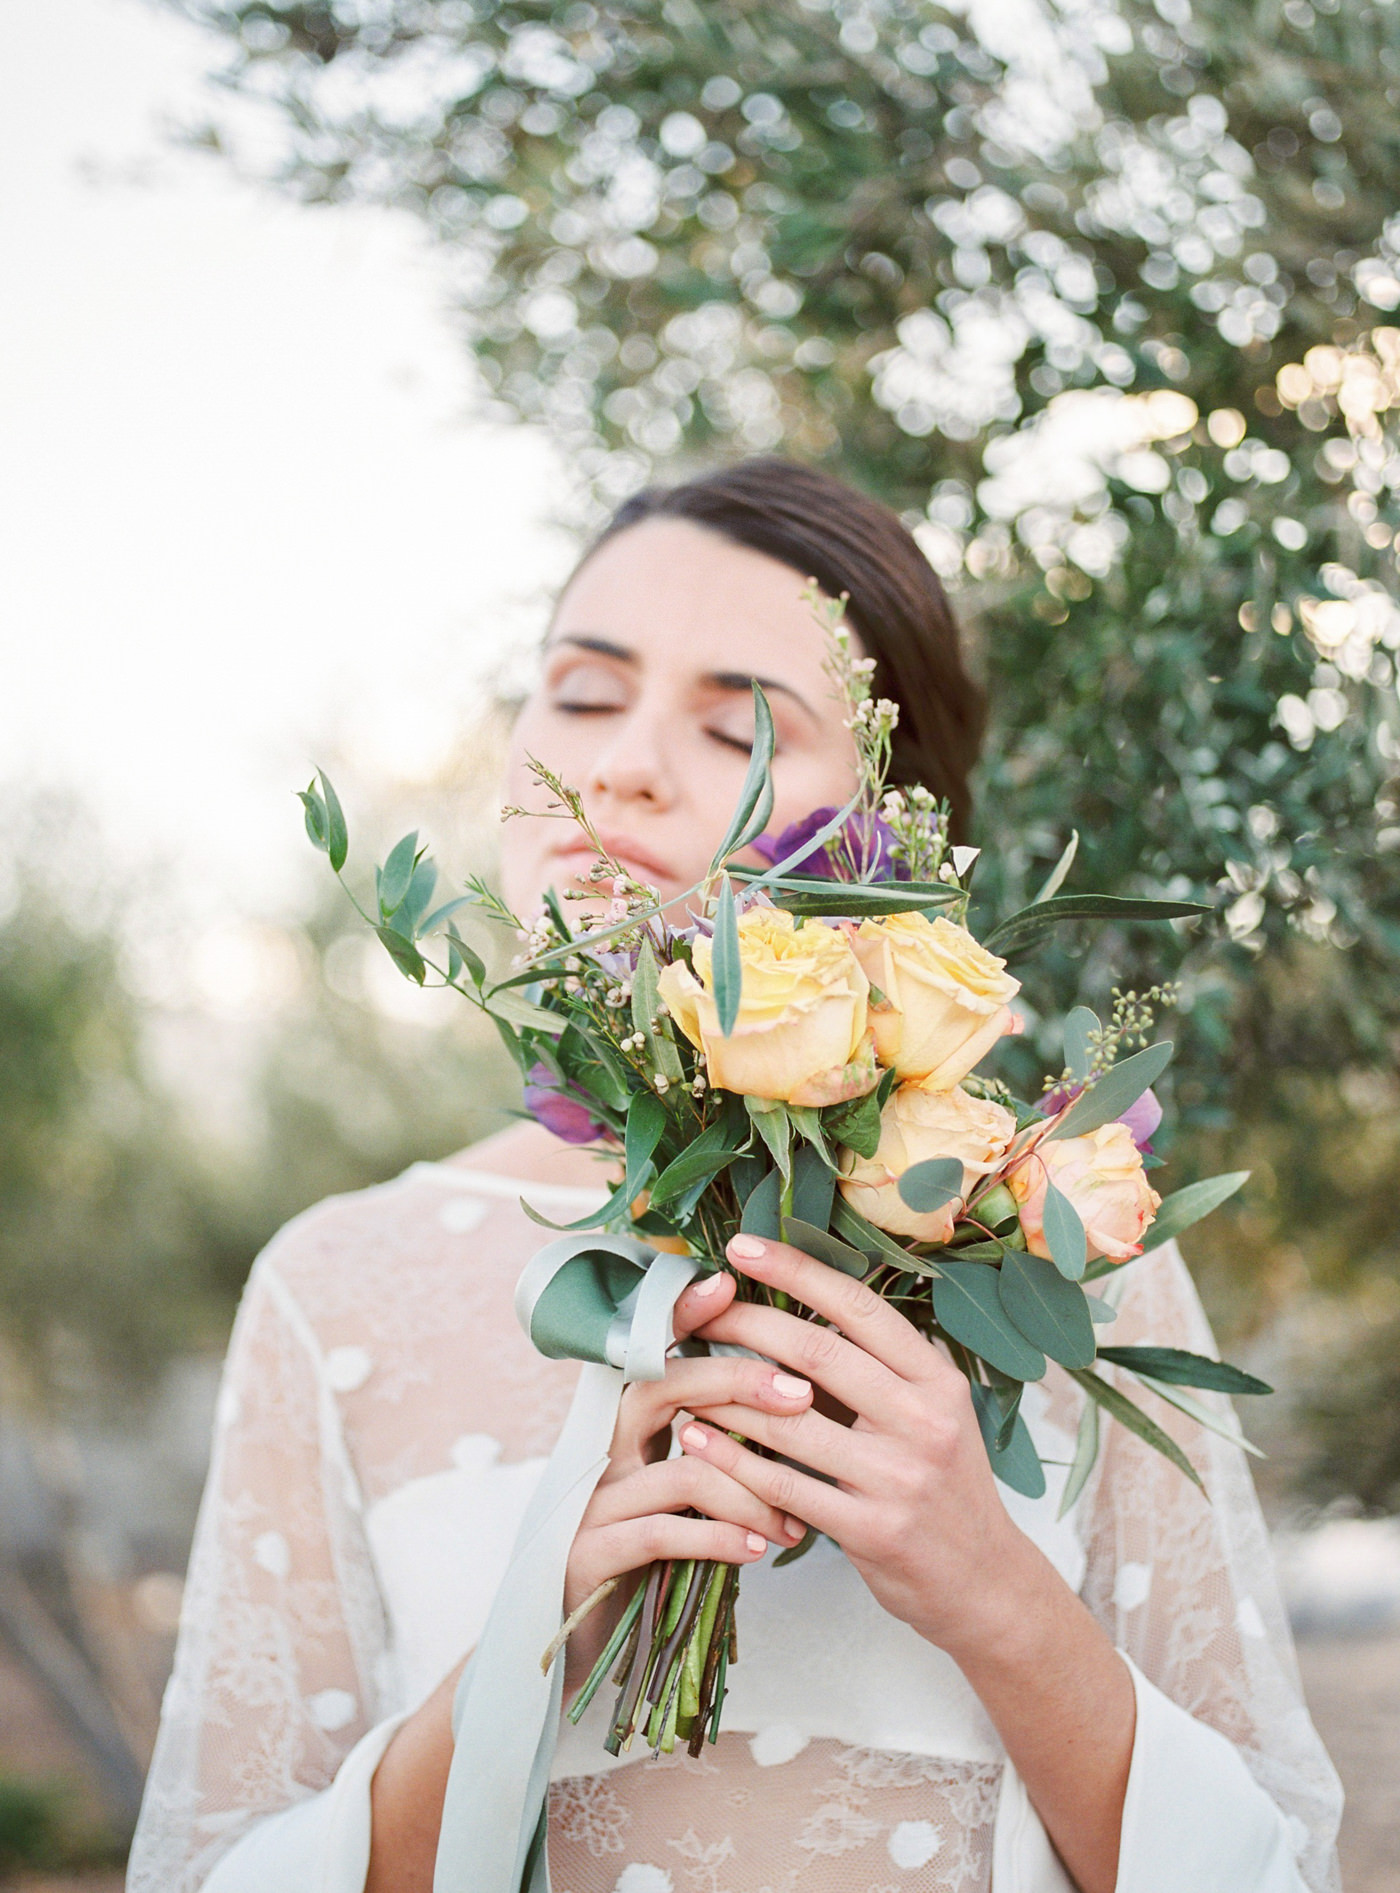 Organic Rehearsal Dinner Inspiration | Chymo & More Photography | Joy Wed | http://www.joy-wed.com